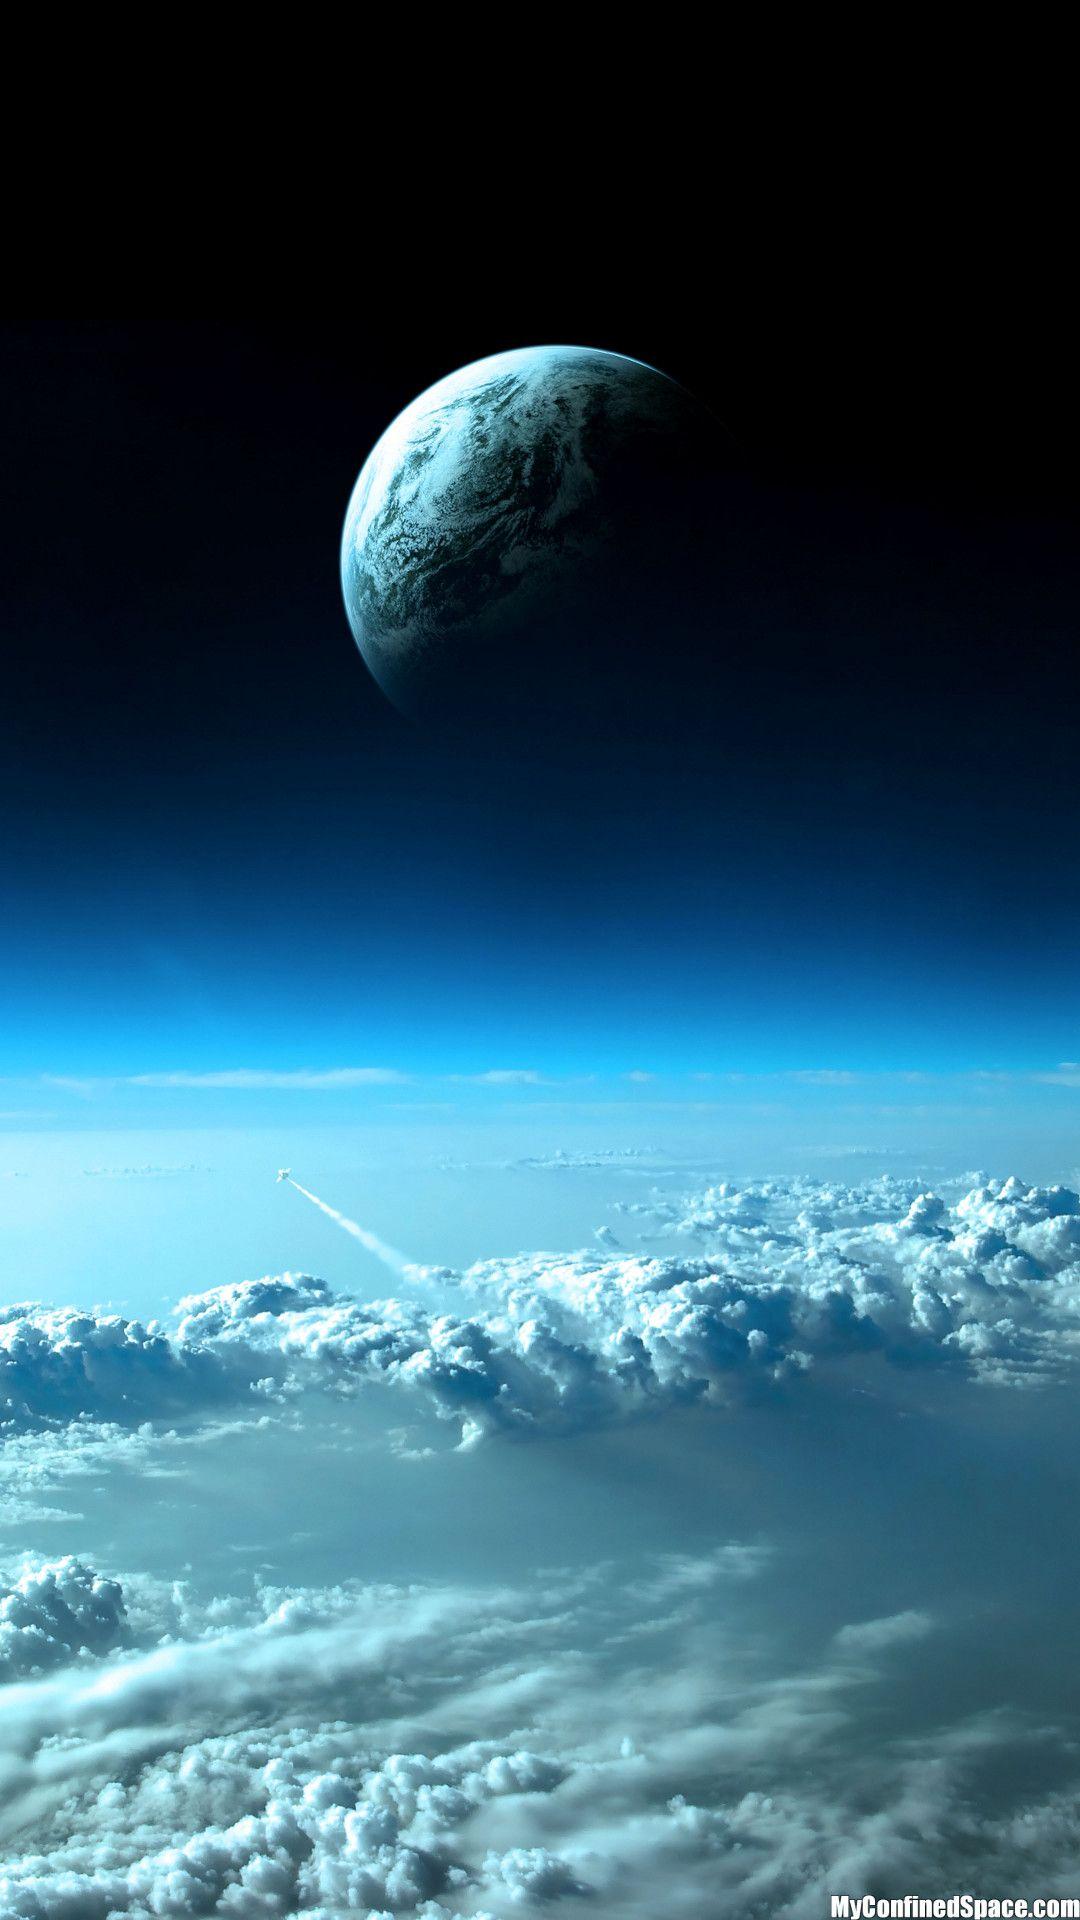 1080x1920 Vertical Hd Wallpapers Space Iphone Wallpaper Wallpaper Earth Planets Wallpaper